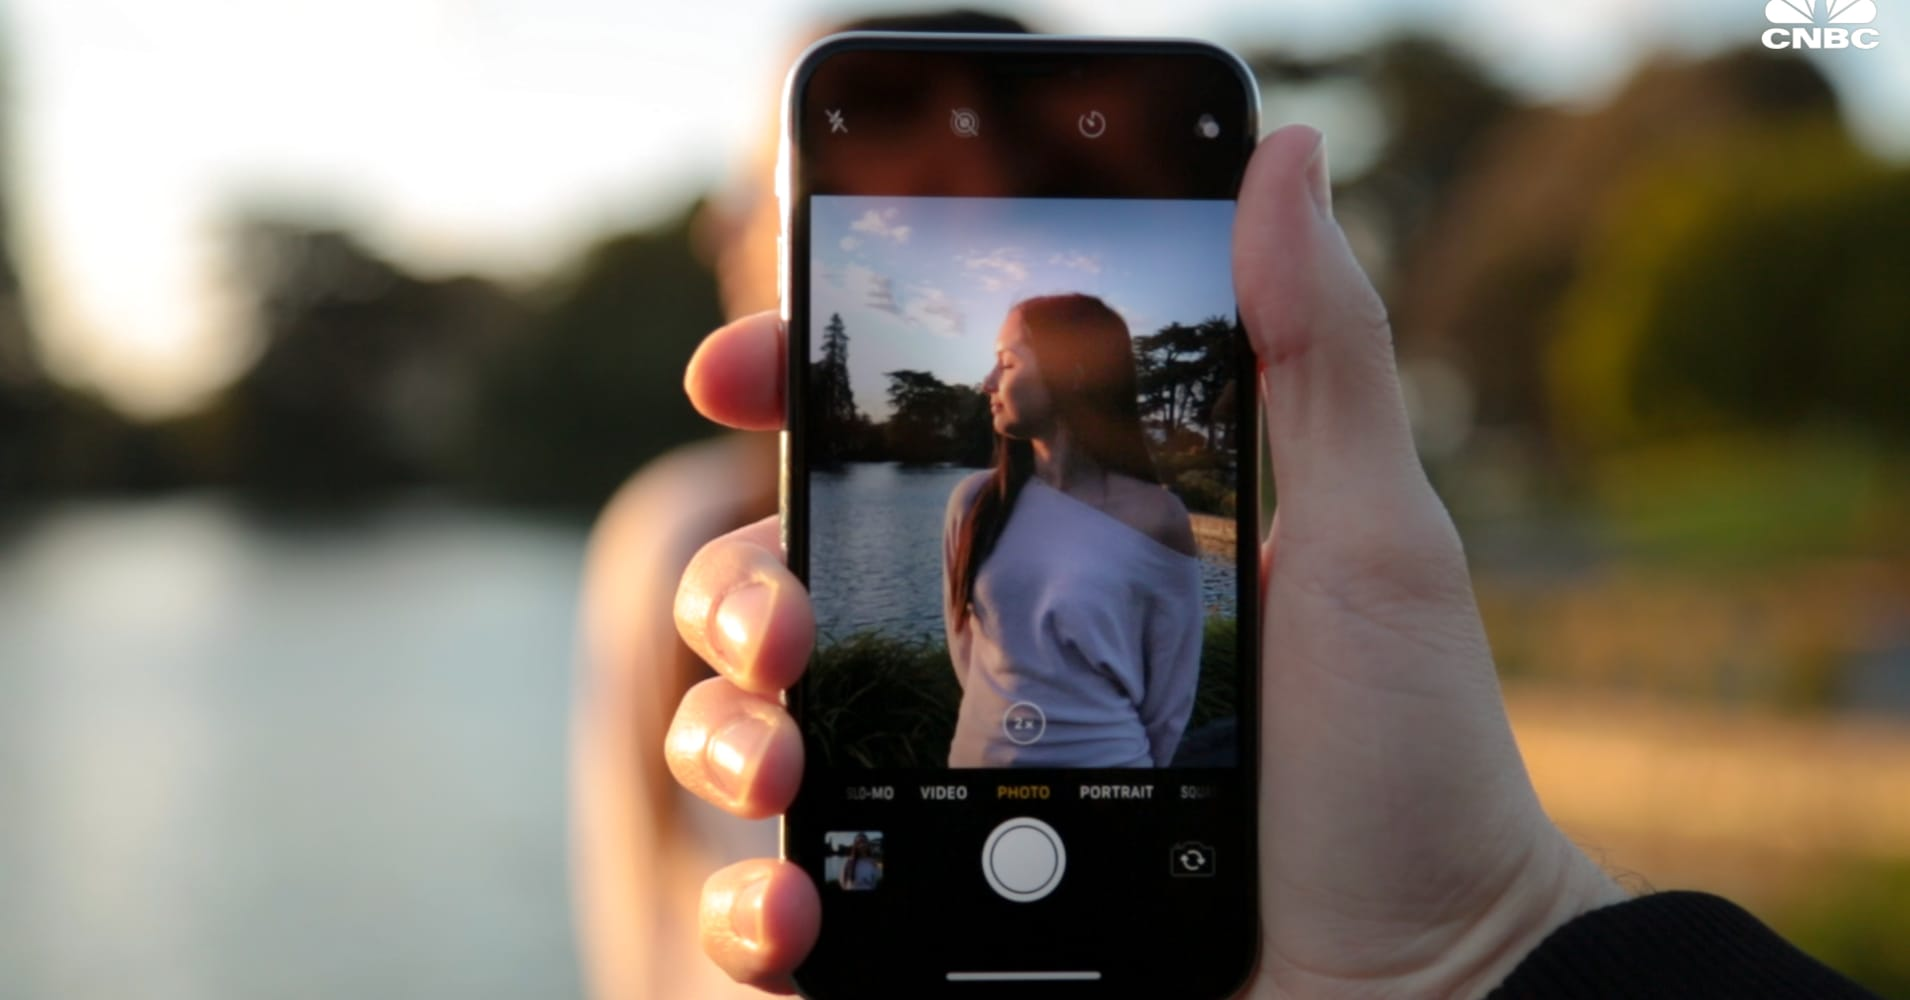 15 amazing photos taken on a smartphone